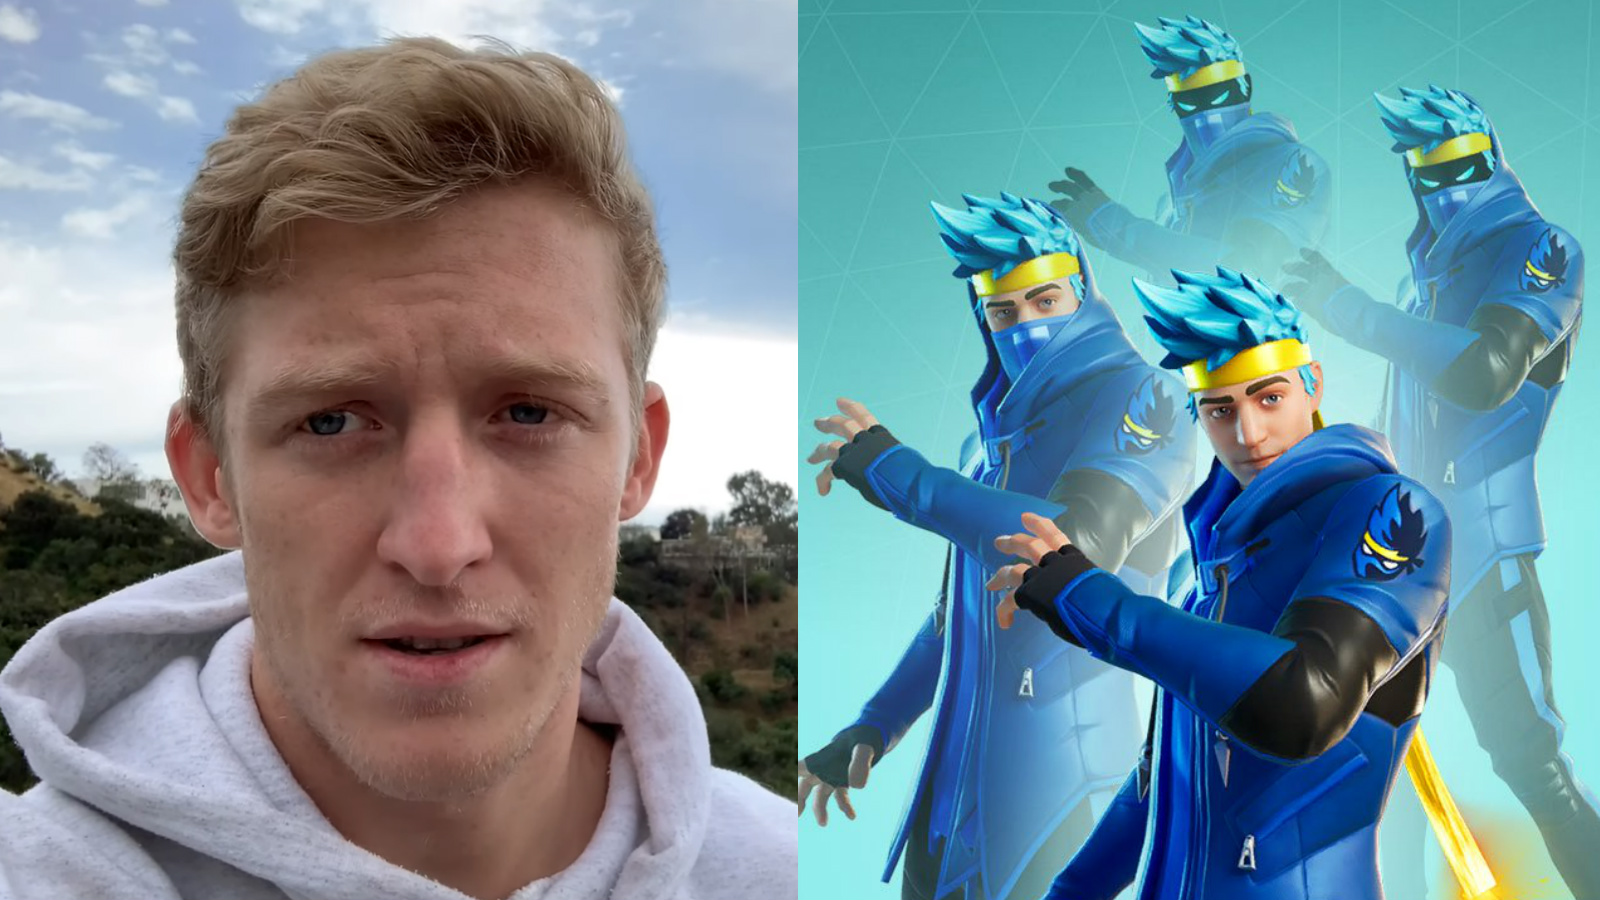 Tfue reacts Fortnite Ninja skin